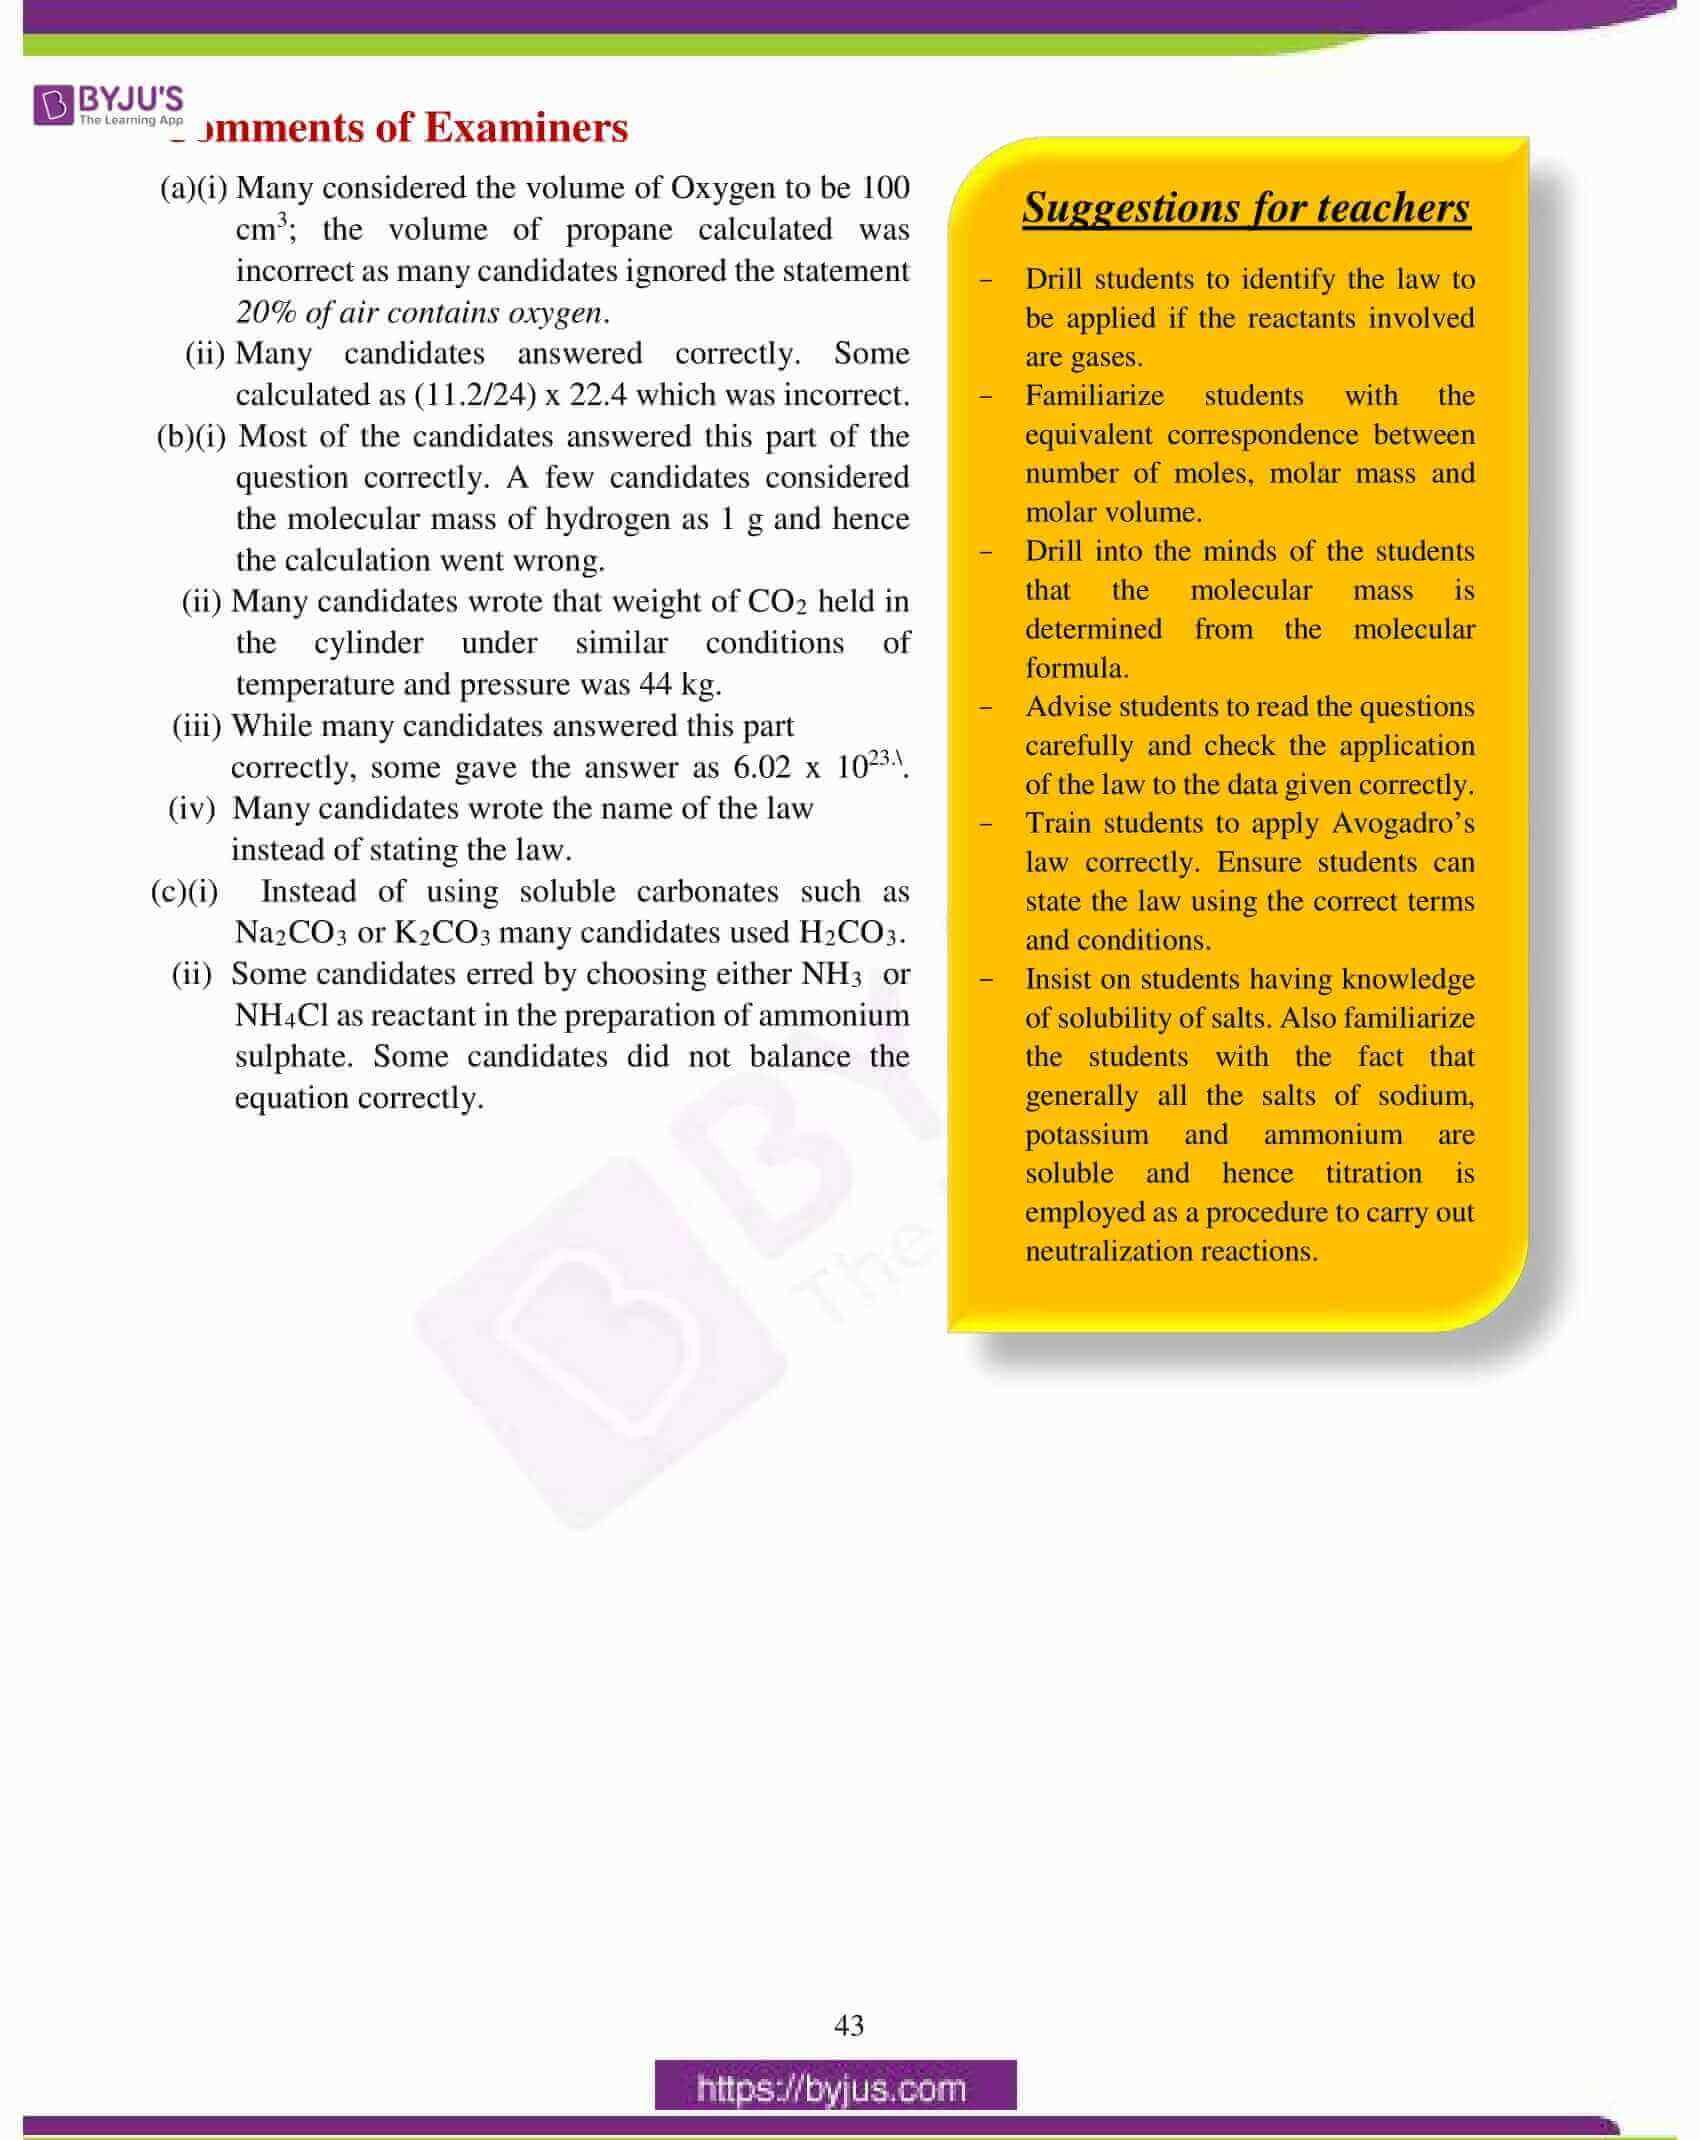 icse class 10 chemistry question paper solution 2017 15